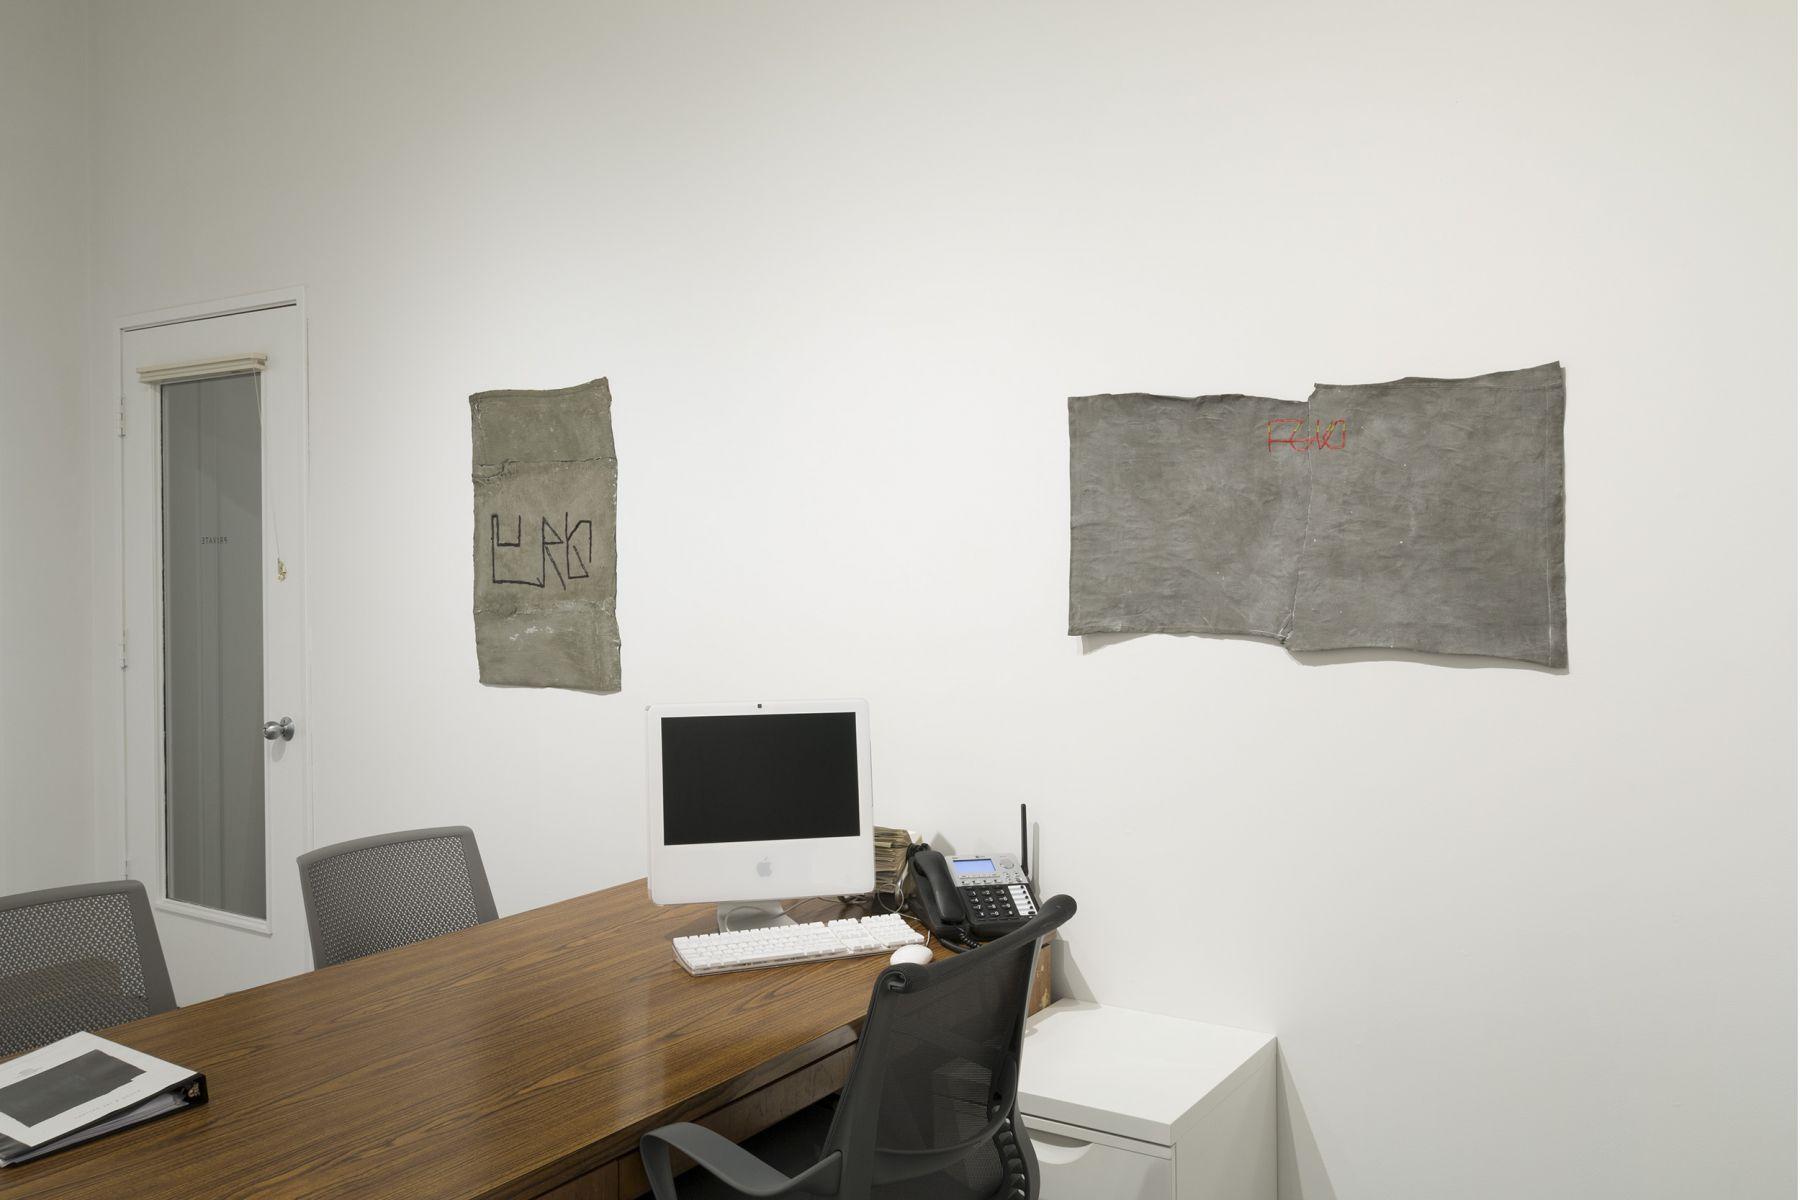 Robert Yoder | Club Number | Installation View 1